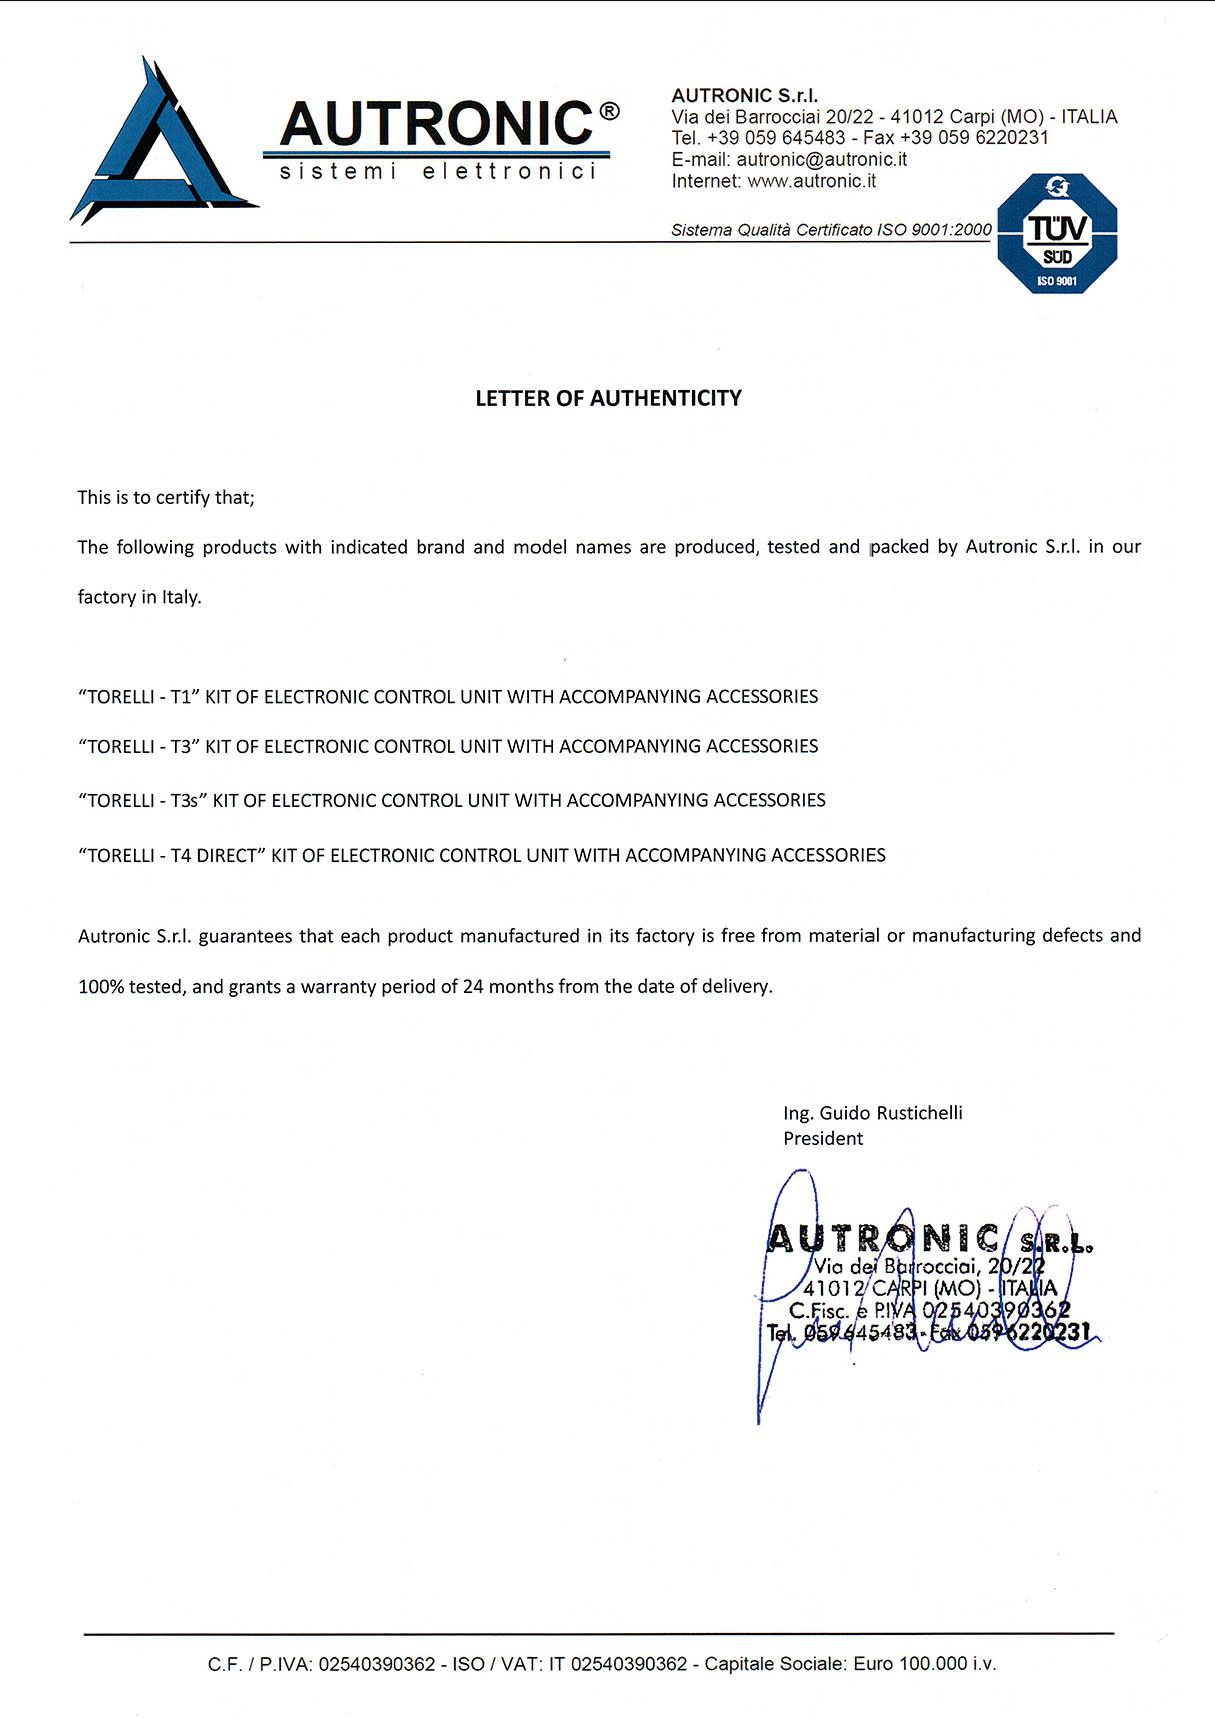 Мини-комплект ГБО 4 поколения Torelli T3 Pro OBD 6 цилиндров, редуктор Torelli Taurus, форсунки Torelli, фильтр, датчик уровня топлива AEB1090